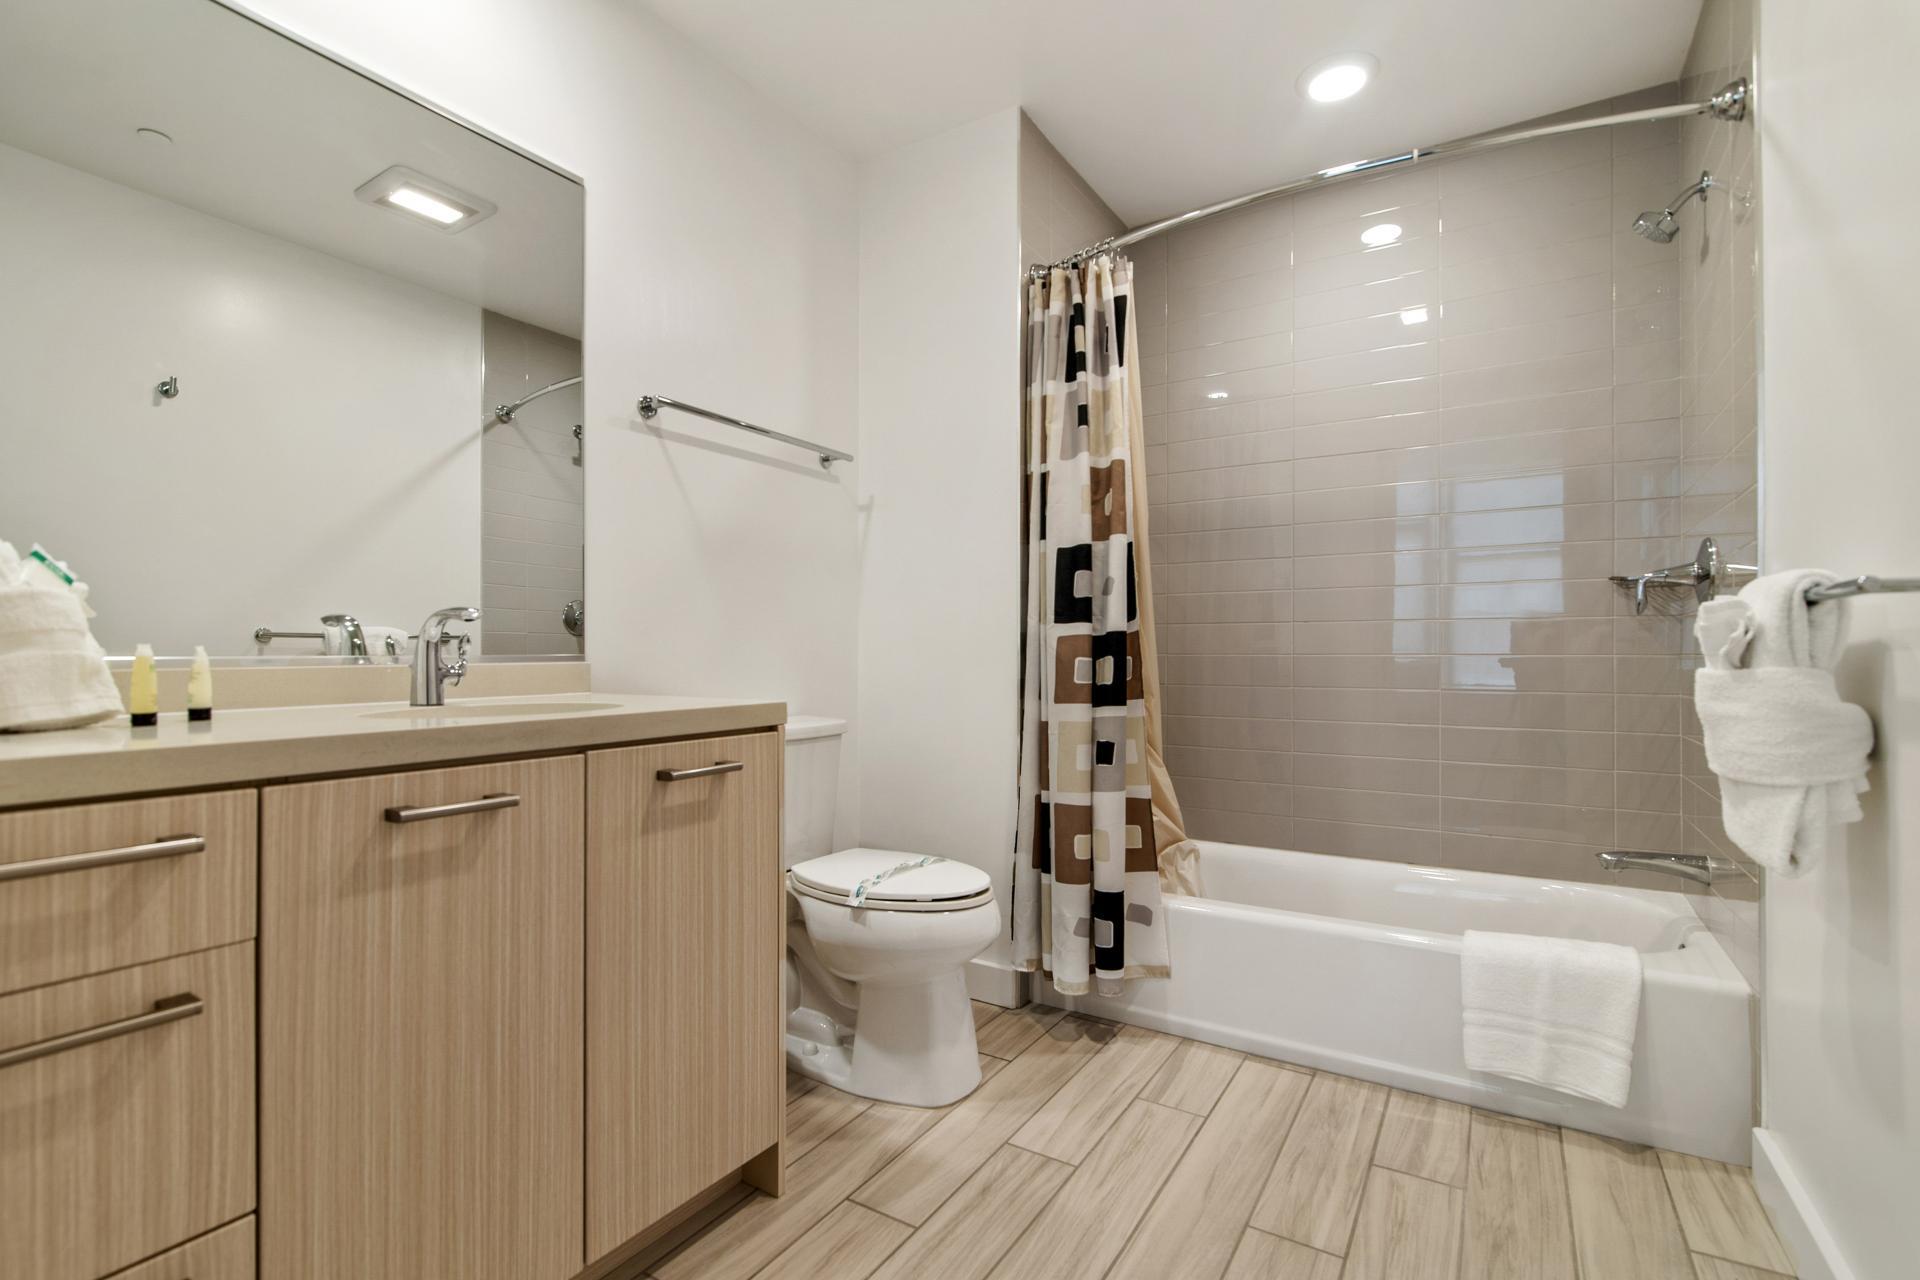 Bathroom at 923 Folsom Street Apartments, Soma, San Francisco